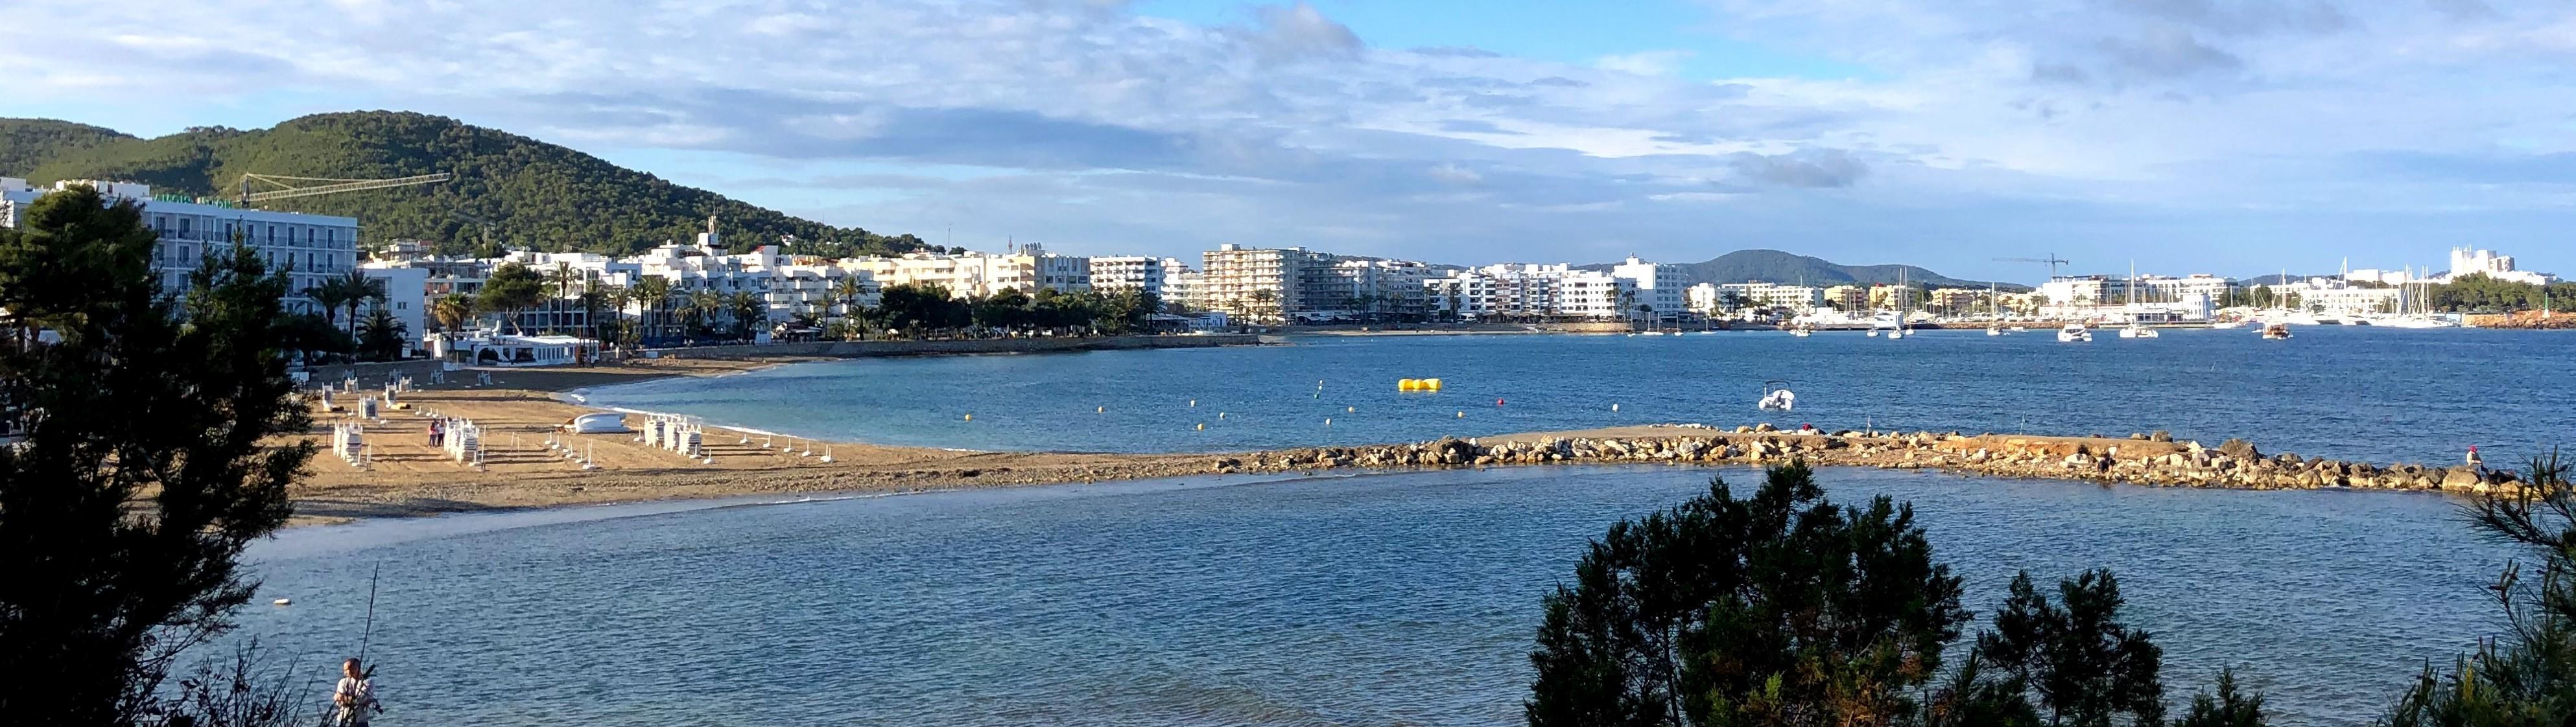 Reisverslag Ibiza